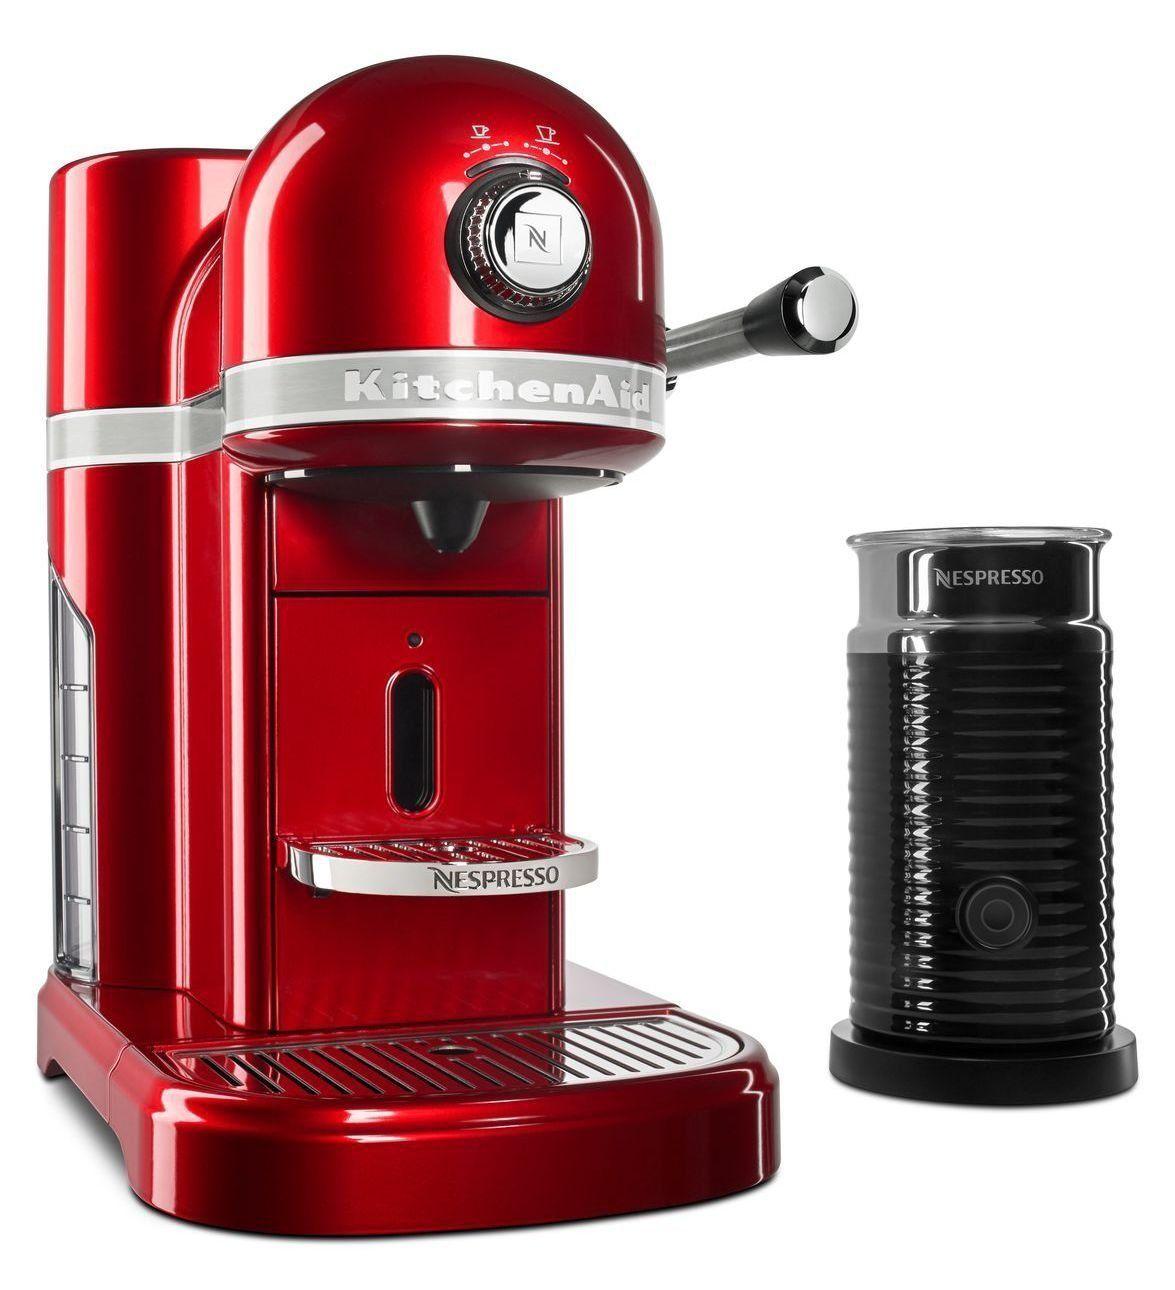 KitchenAid Nespresso Candy Apple Red Manual Espresso Maker